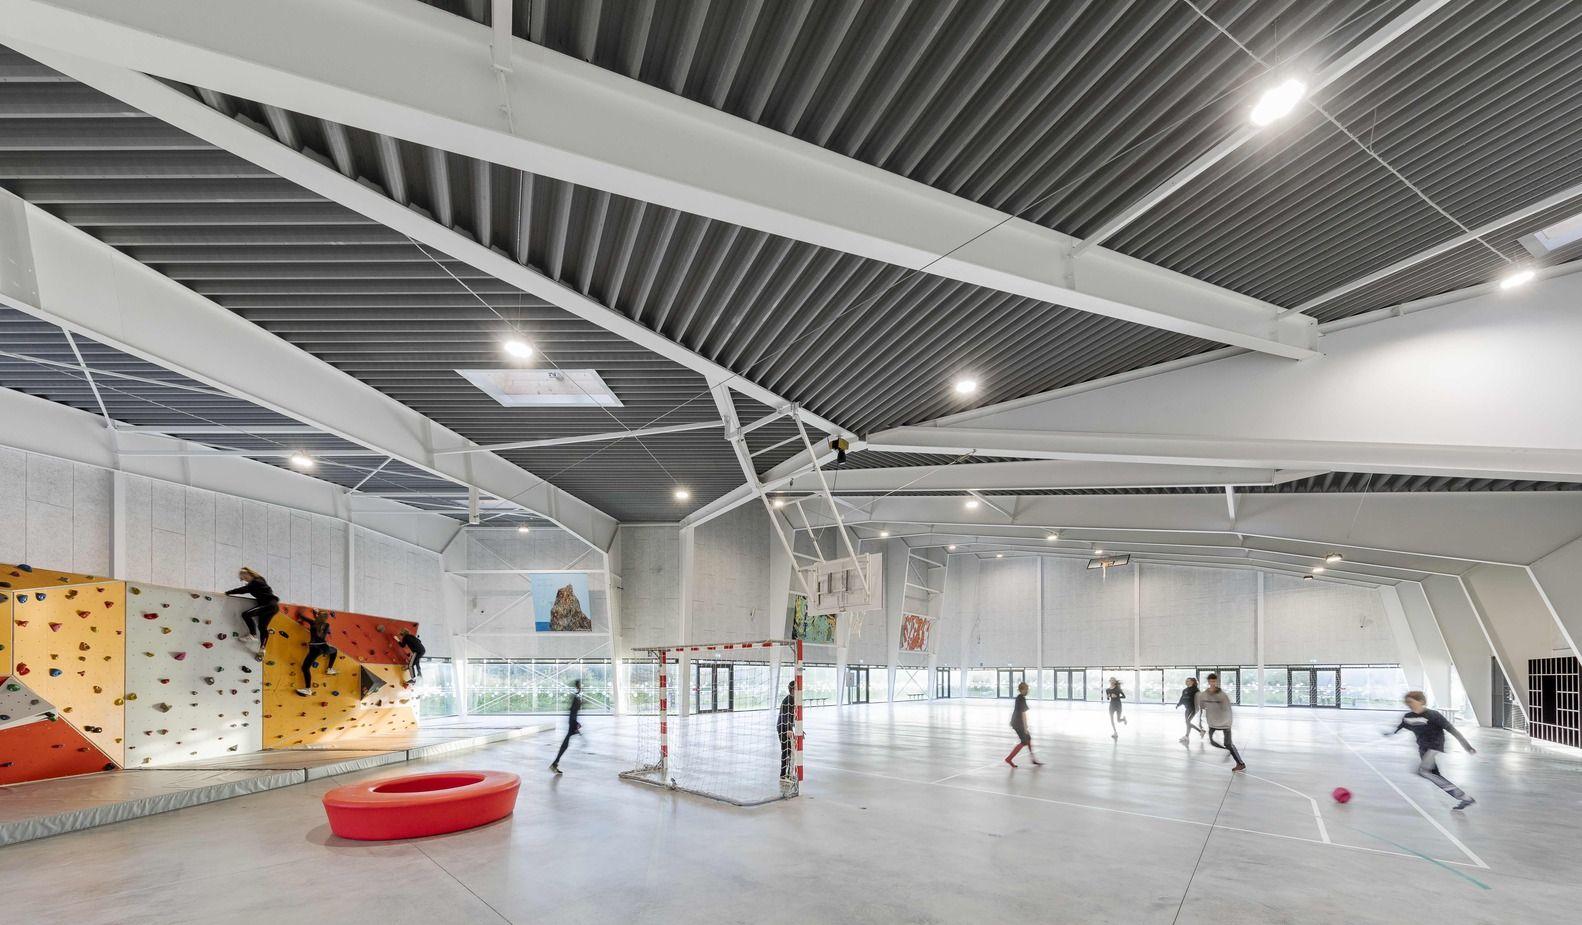 Gallery Of Multi Purpose Sports Facility In Orestad City Nord Architects 10 Architect Space Architecture City Design